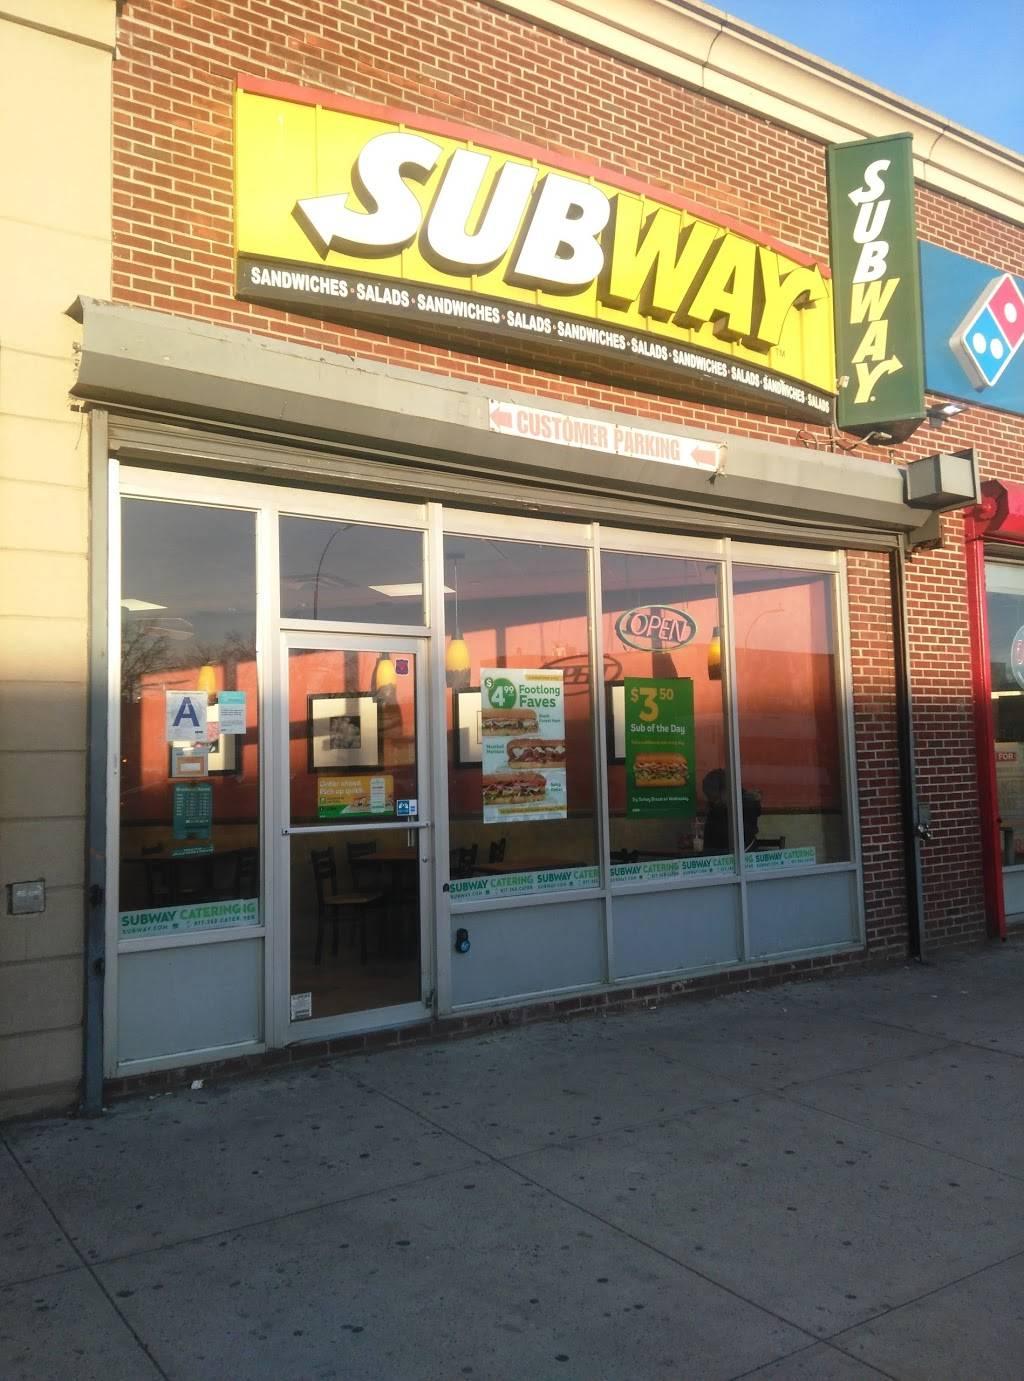 Subway Restaurants | restaurant | 241 Rockaway Pkwy, Brooklyn, NY 11212, USA | 7183466550 OR +1 718-346-6550